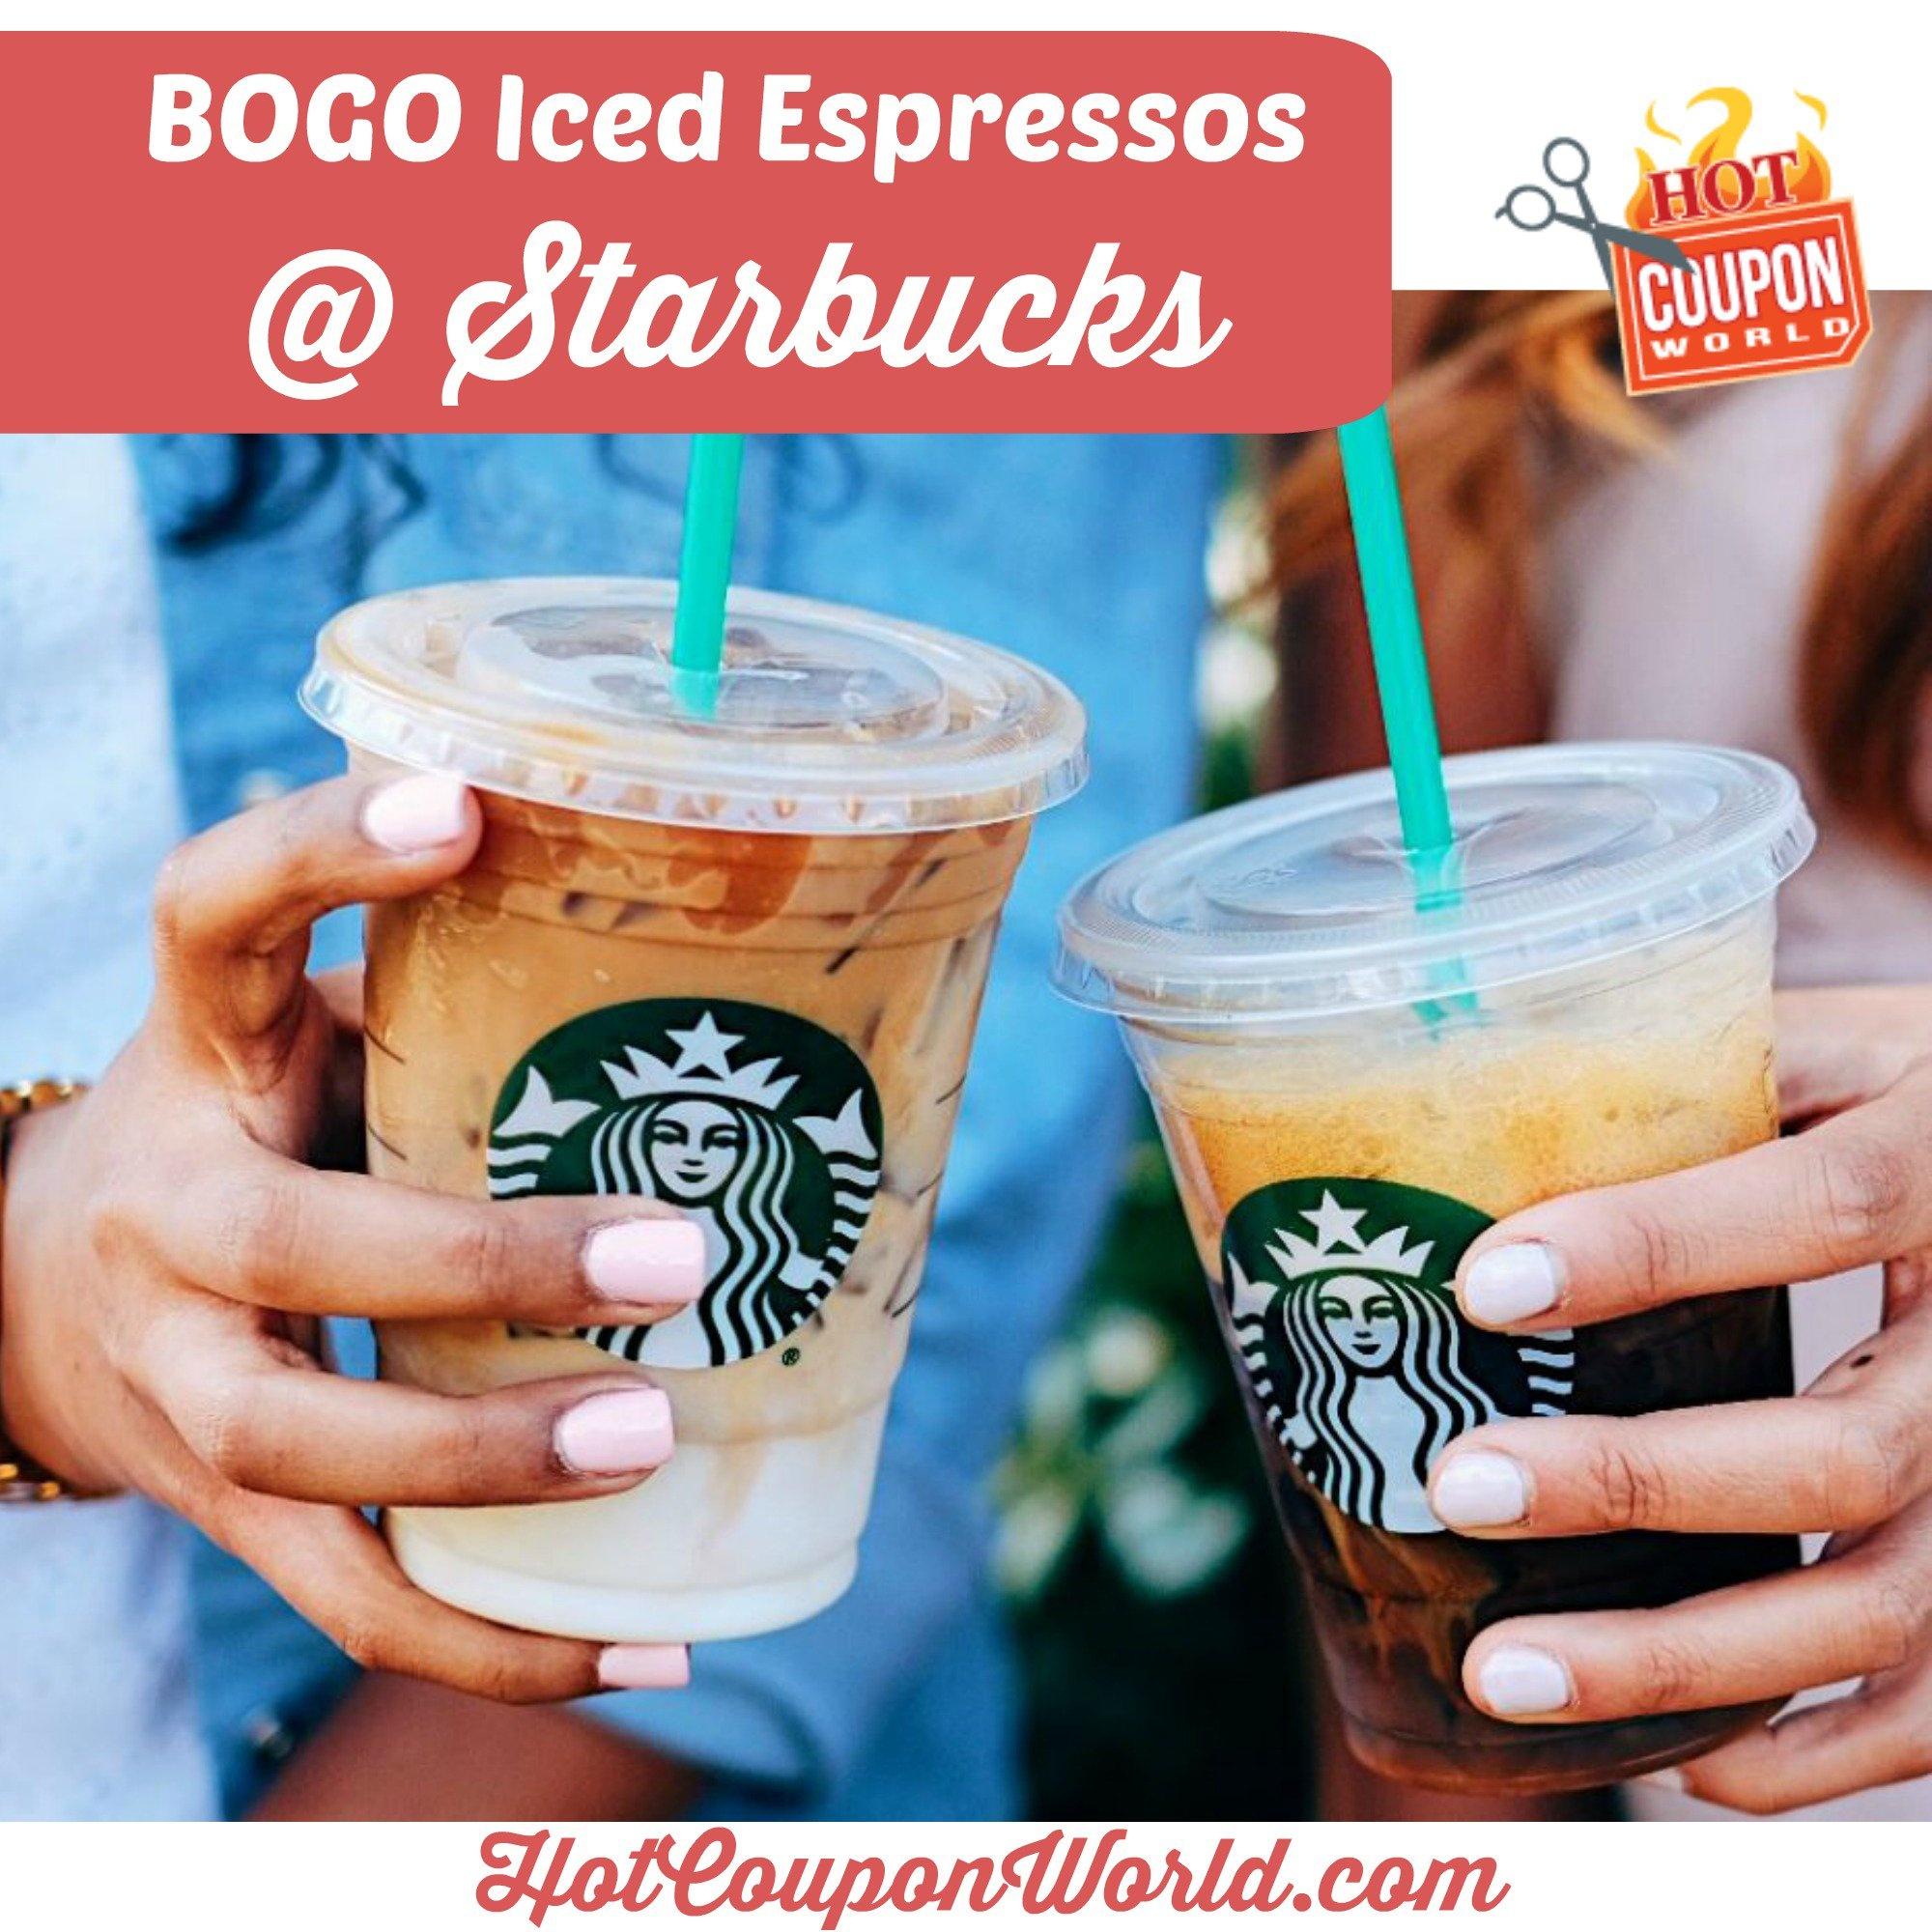 Starbucks Grande Iced Espresso: Bogo Free Event | Hot Coupon World - Free Starbucks Coupon Printable